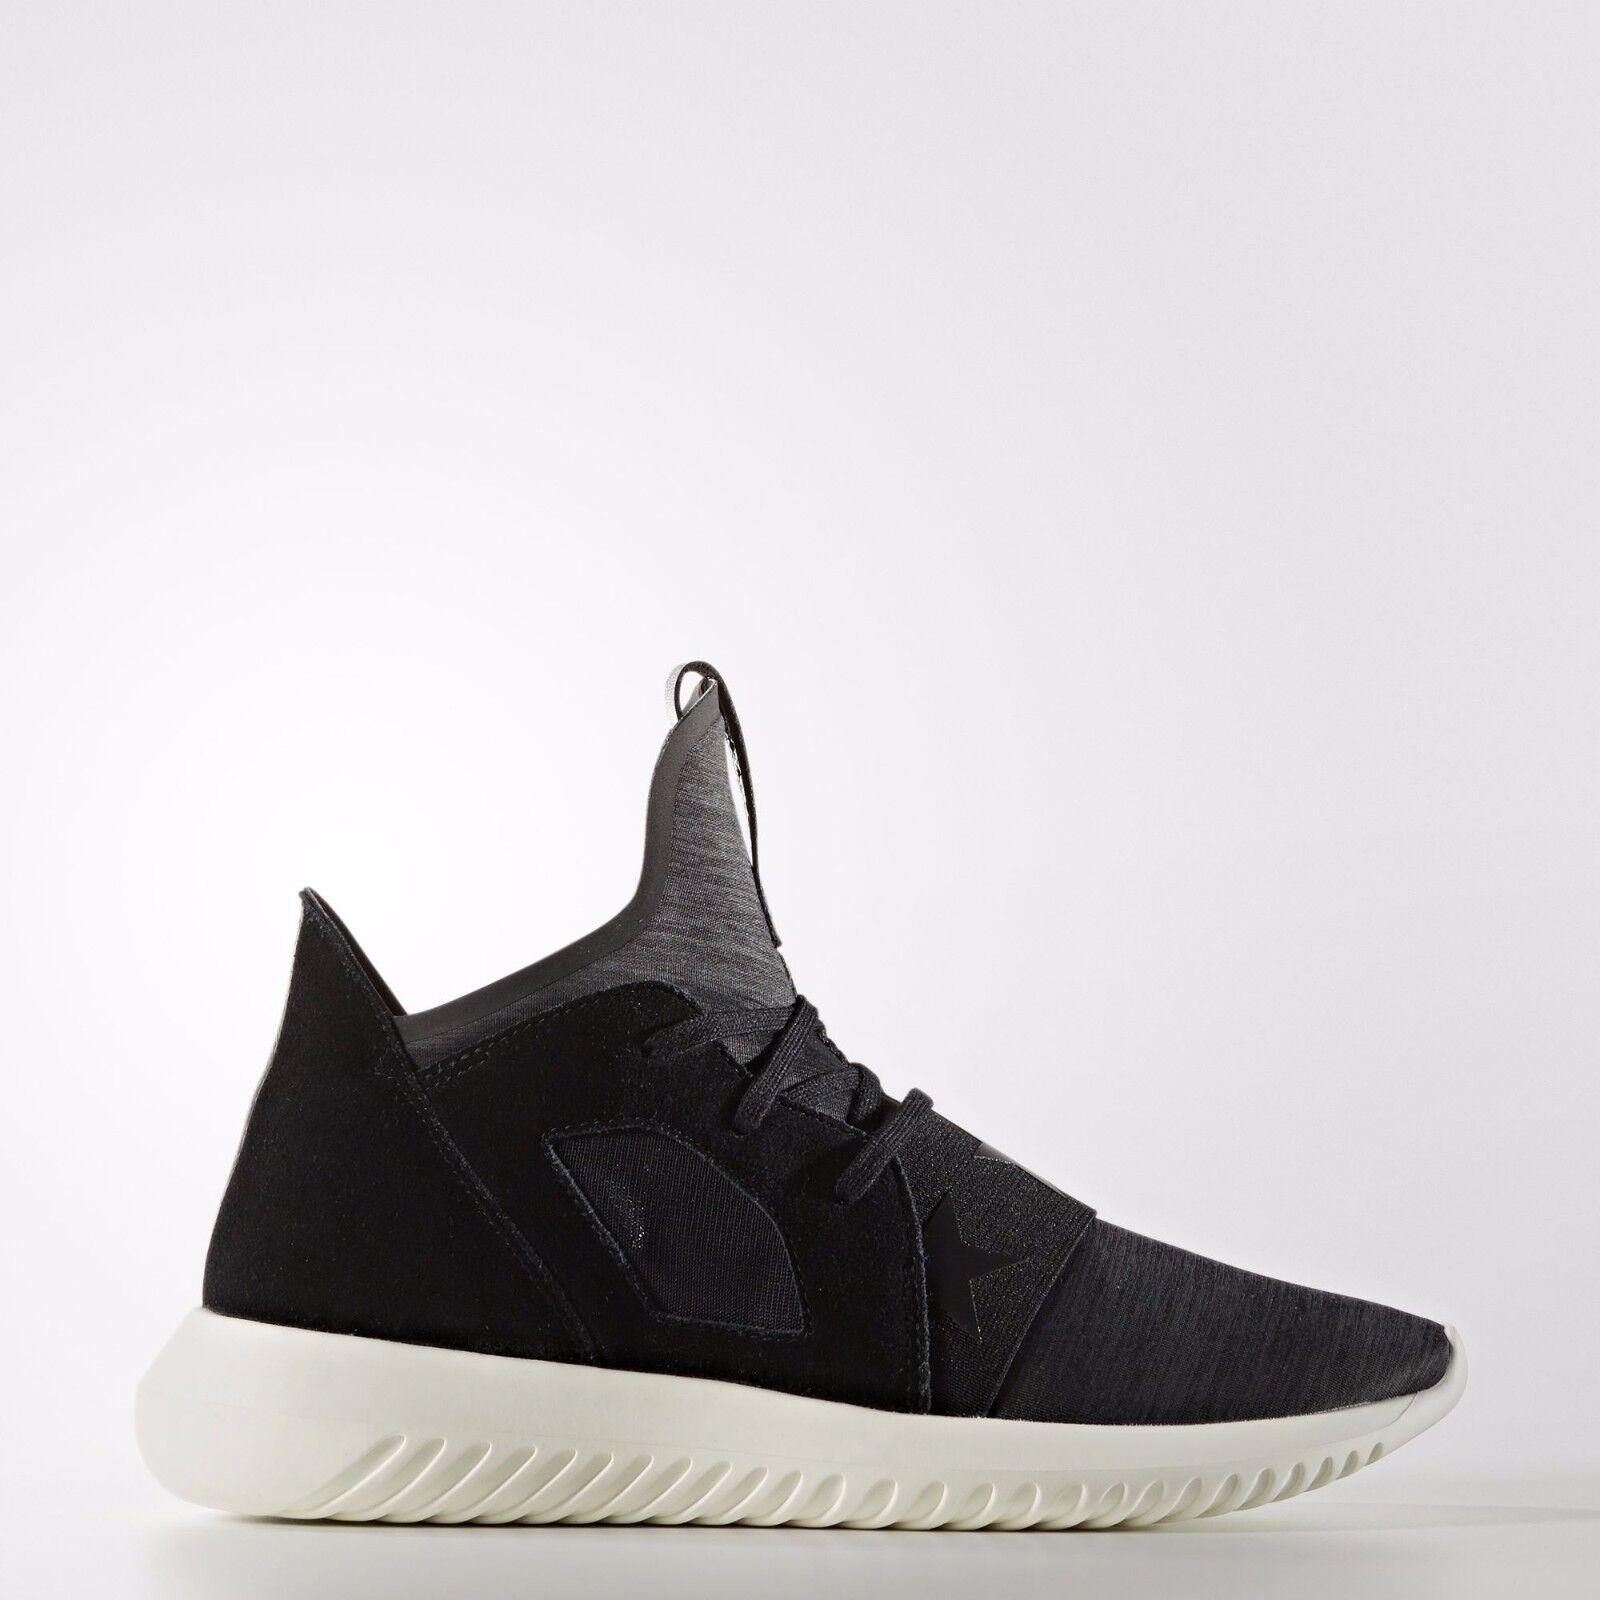 Adidas Women's Tubular Defiant NEW AUTHENTIC Black/Black/White S80291 : size 9.5